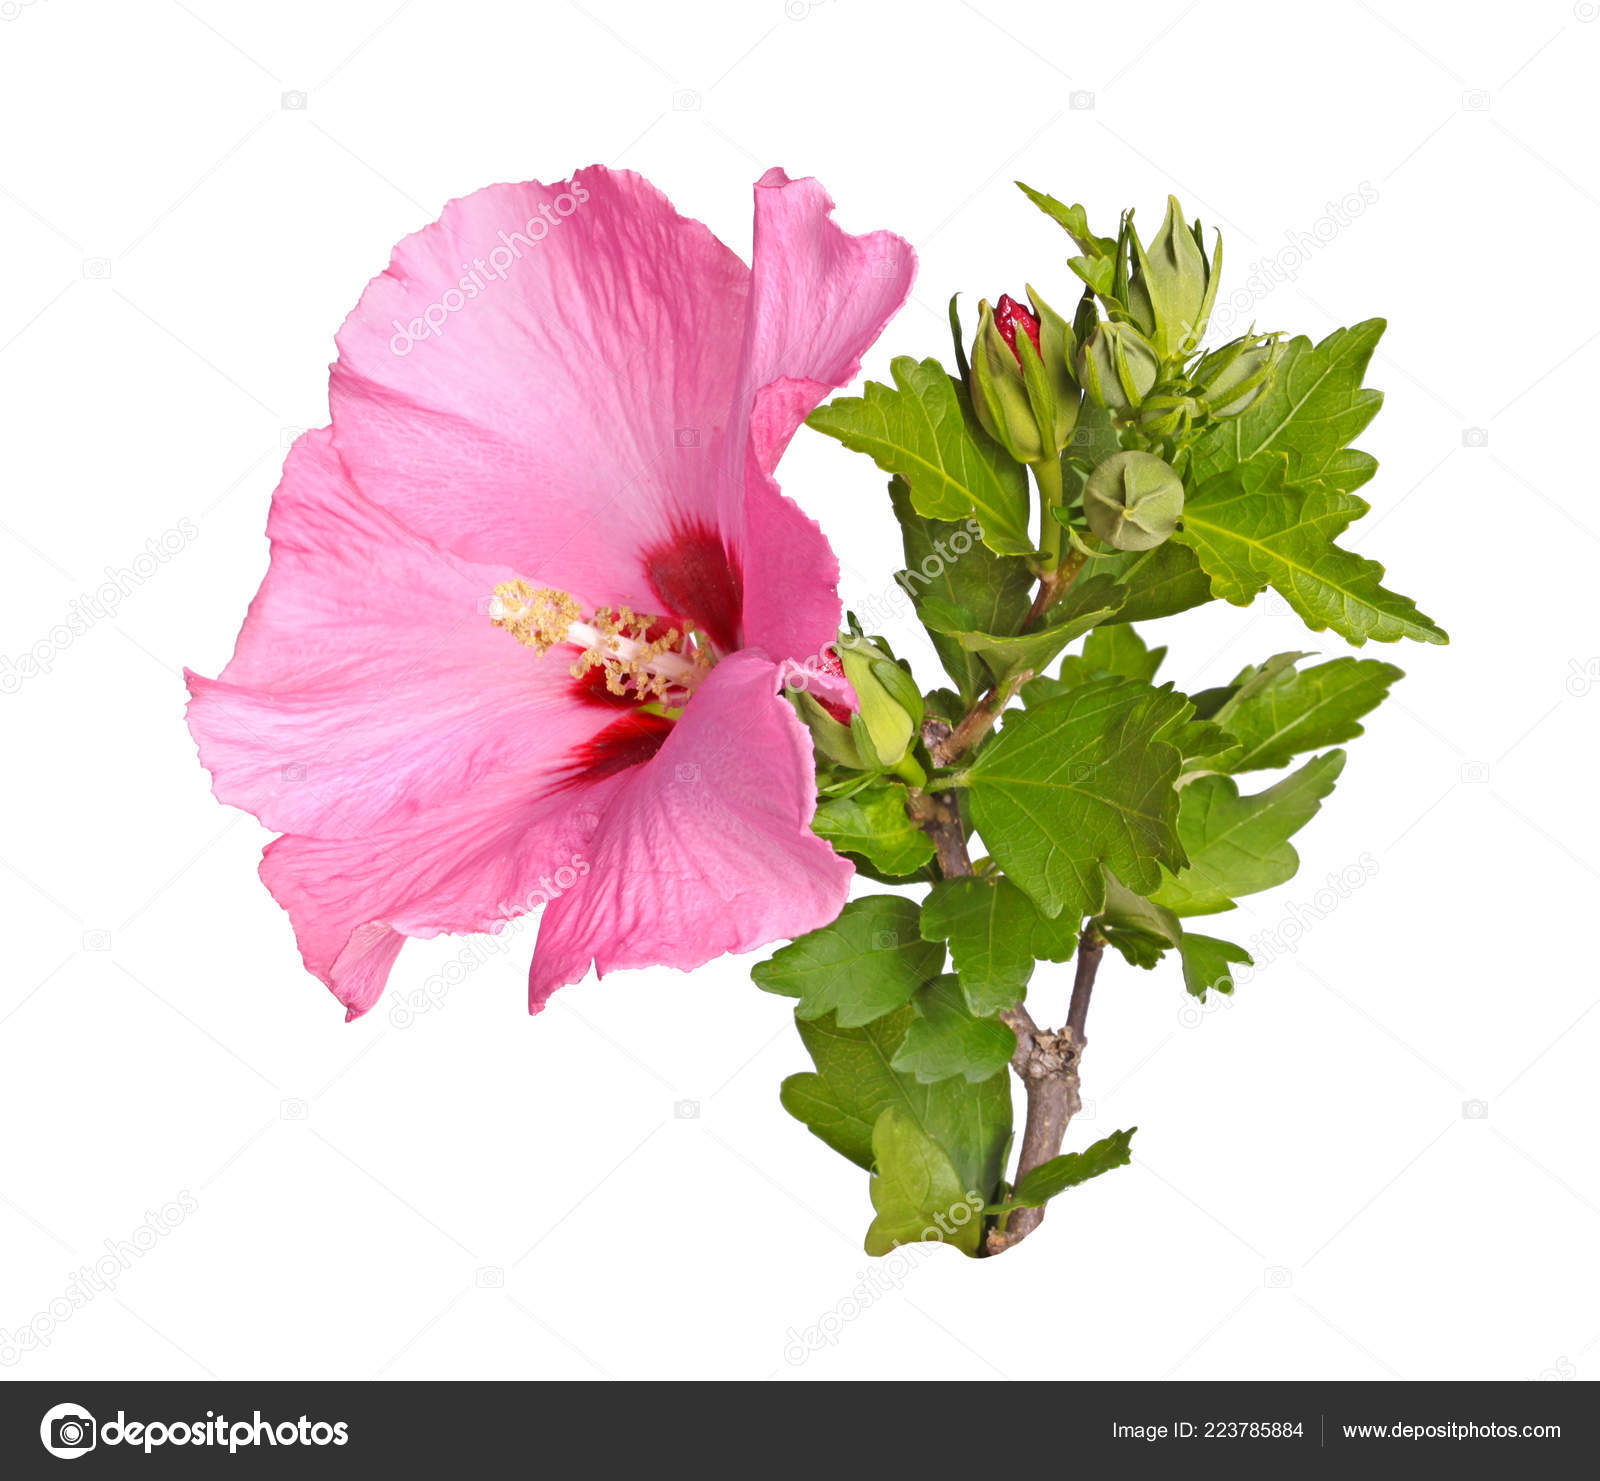 Single Purple Flower Numerous Buds Leaves Stem Rose Sharon Hibiscus